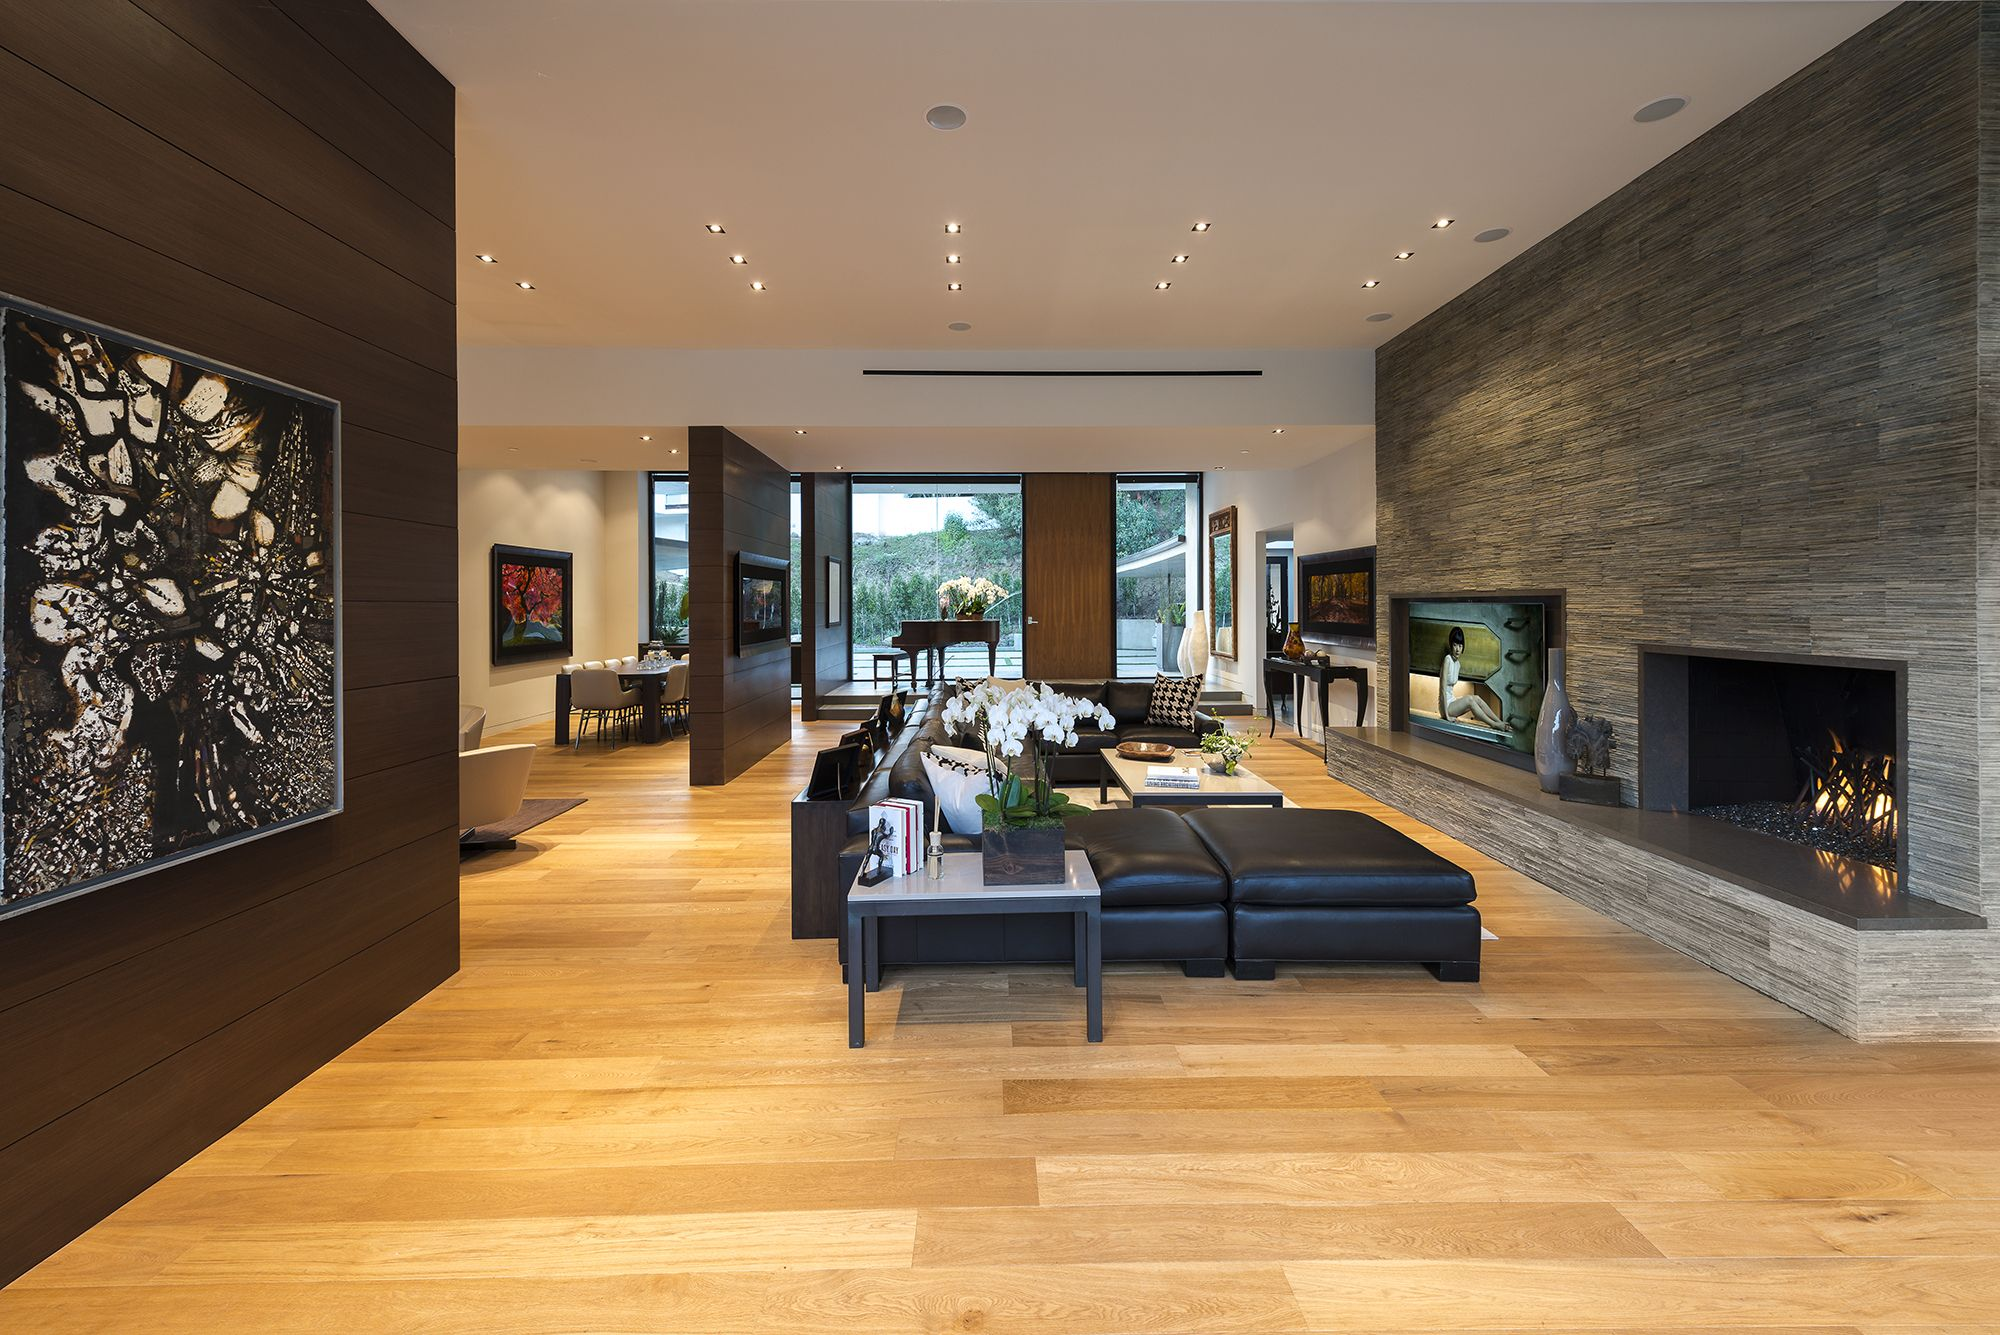 wohnzimmer design kamin  Contemporary house, Modern houses